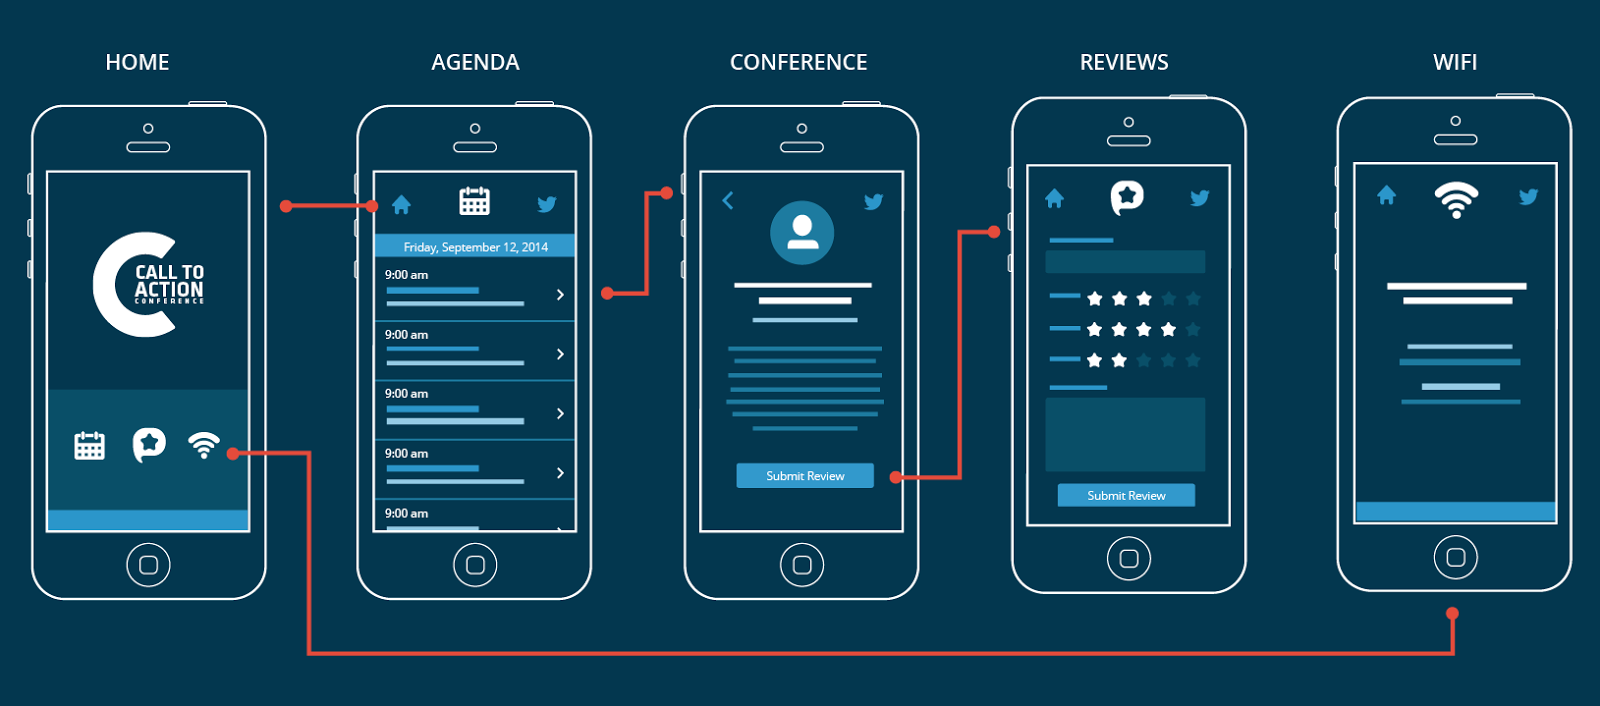 Xcode tutorials for beginners for App layout design online